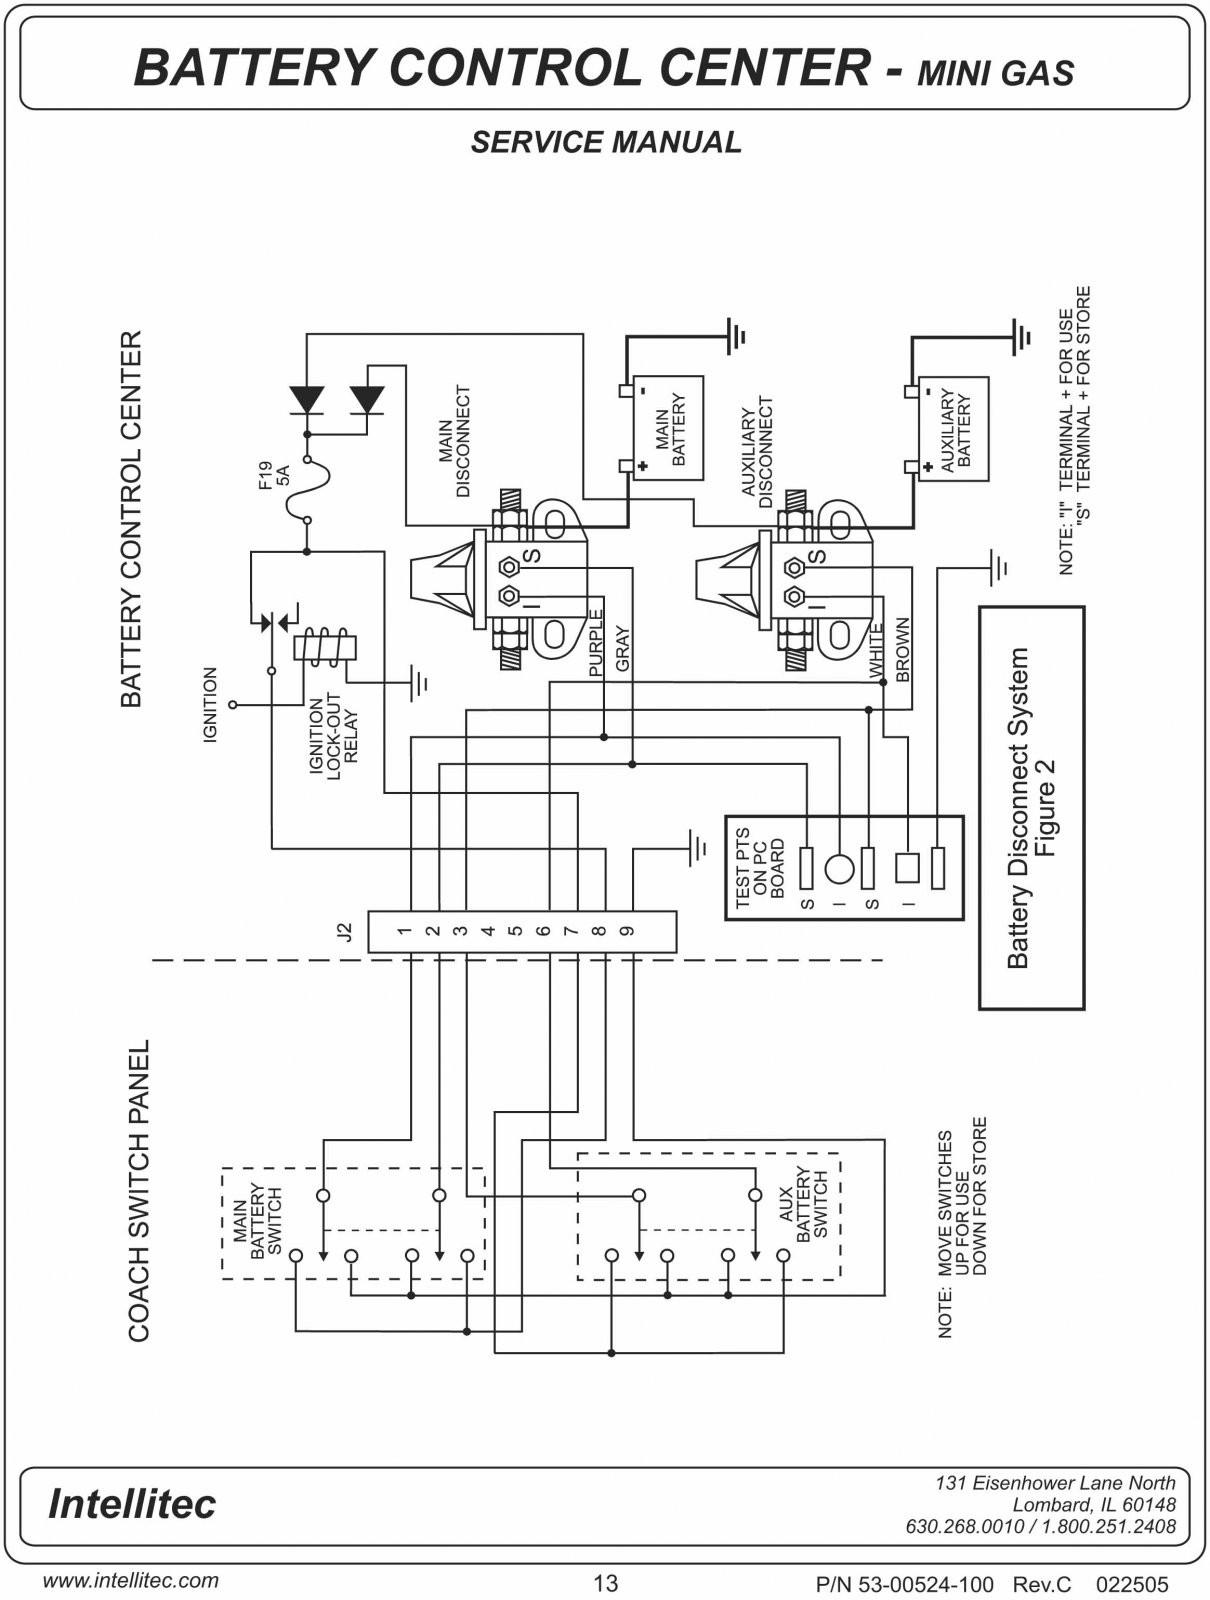 Diagram 3 Battery Wiring Diagram For 1985 Fleetwood Southwind Full Version Hd Quality Fleetwood Southwind Digitalalchemy Molinofllibraga It